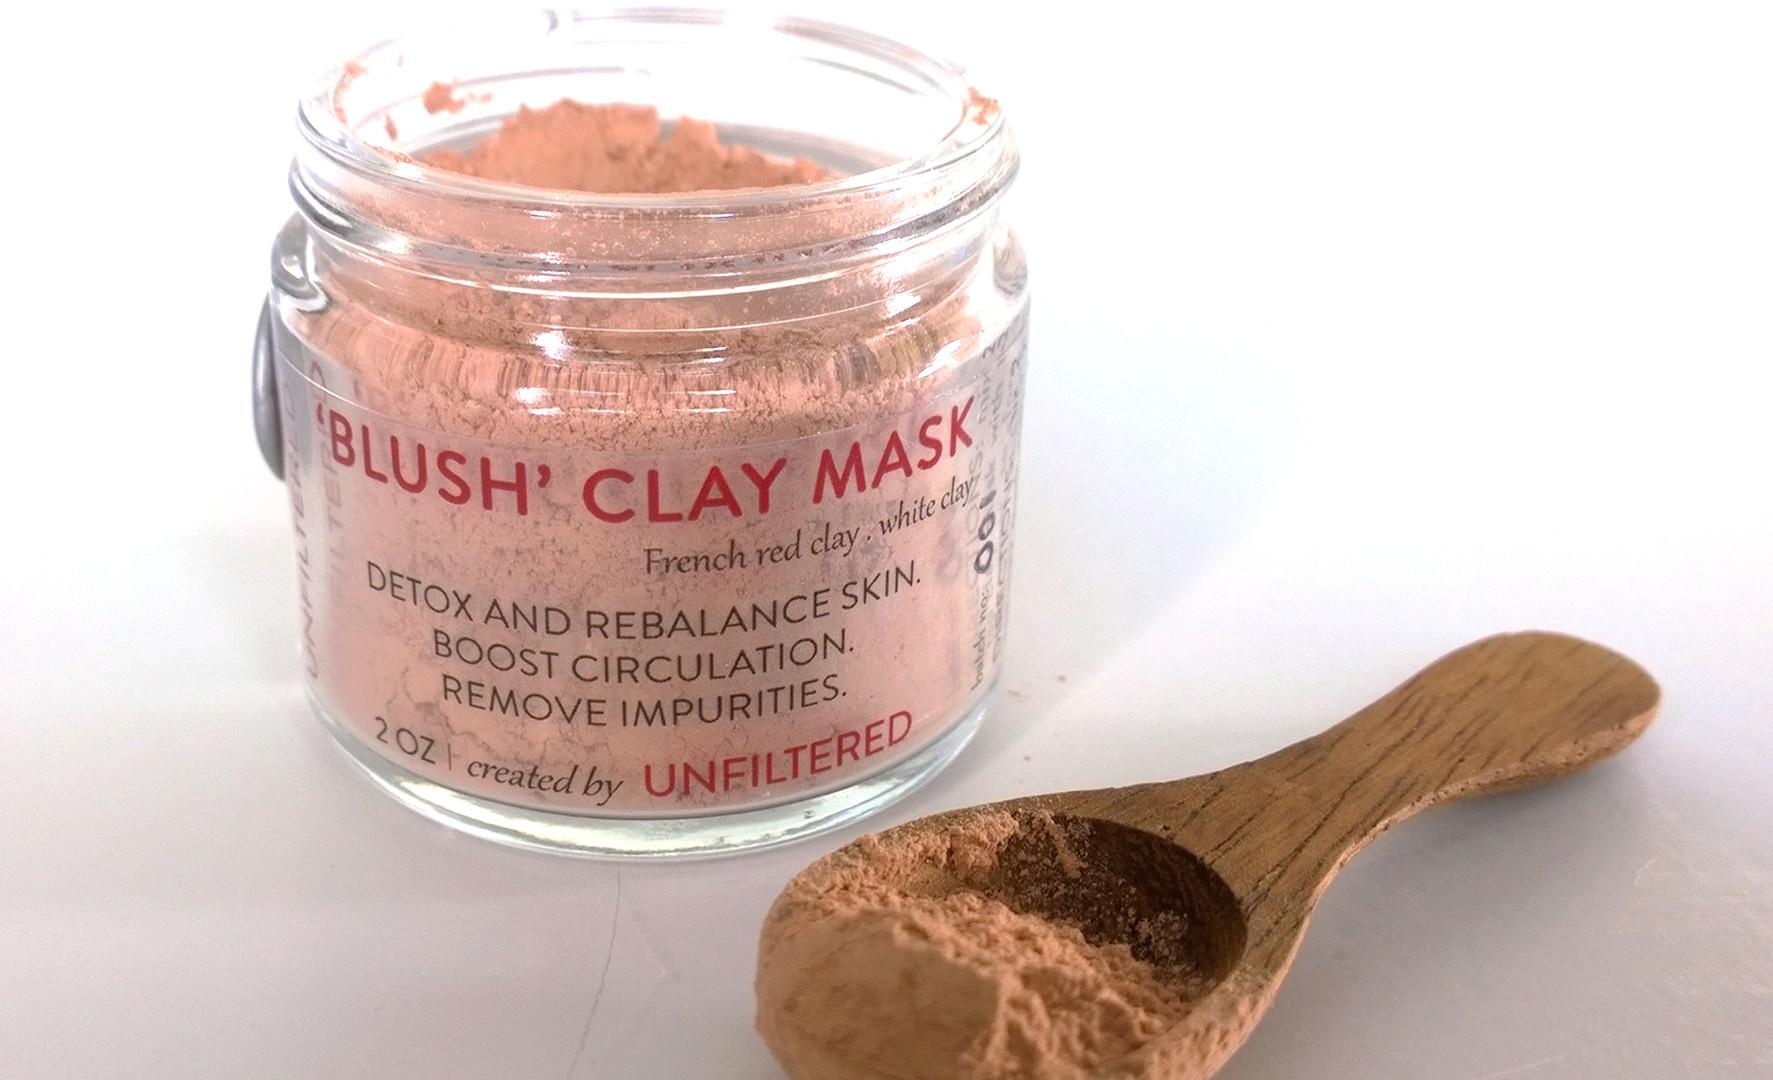 blush clay mask spoon.jpg